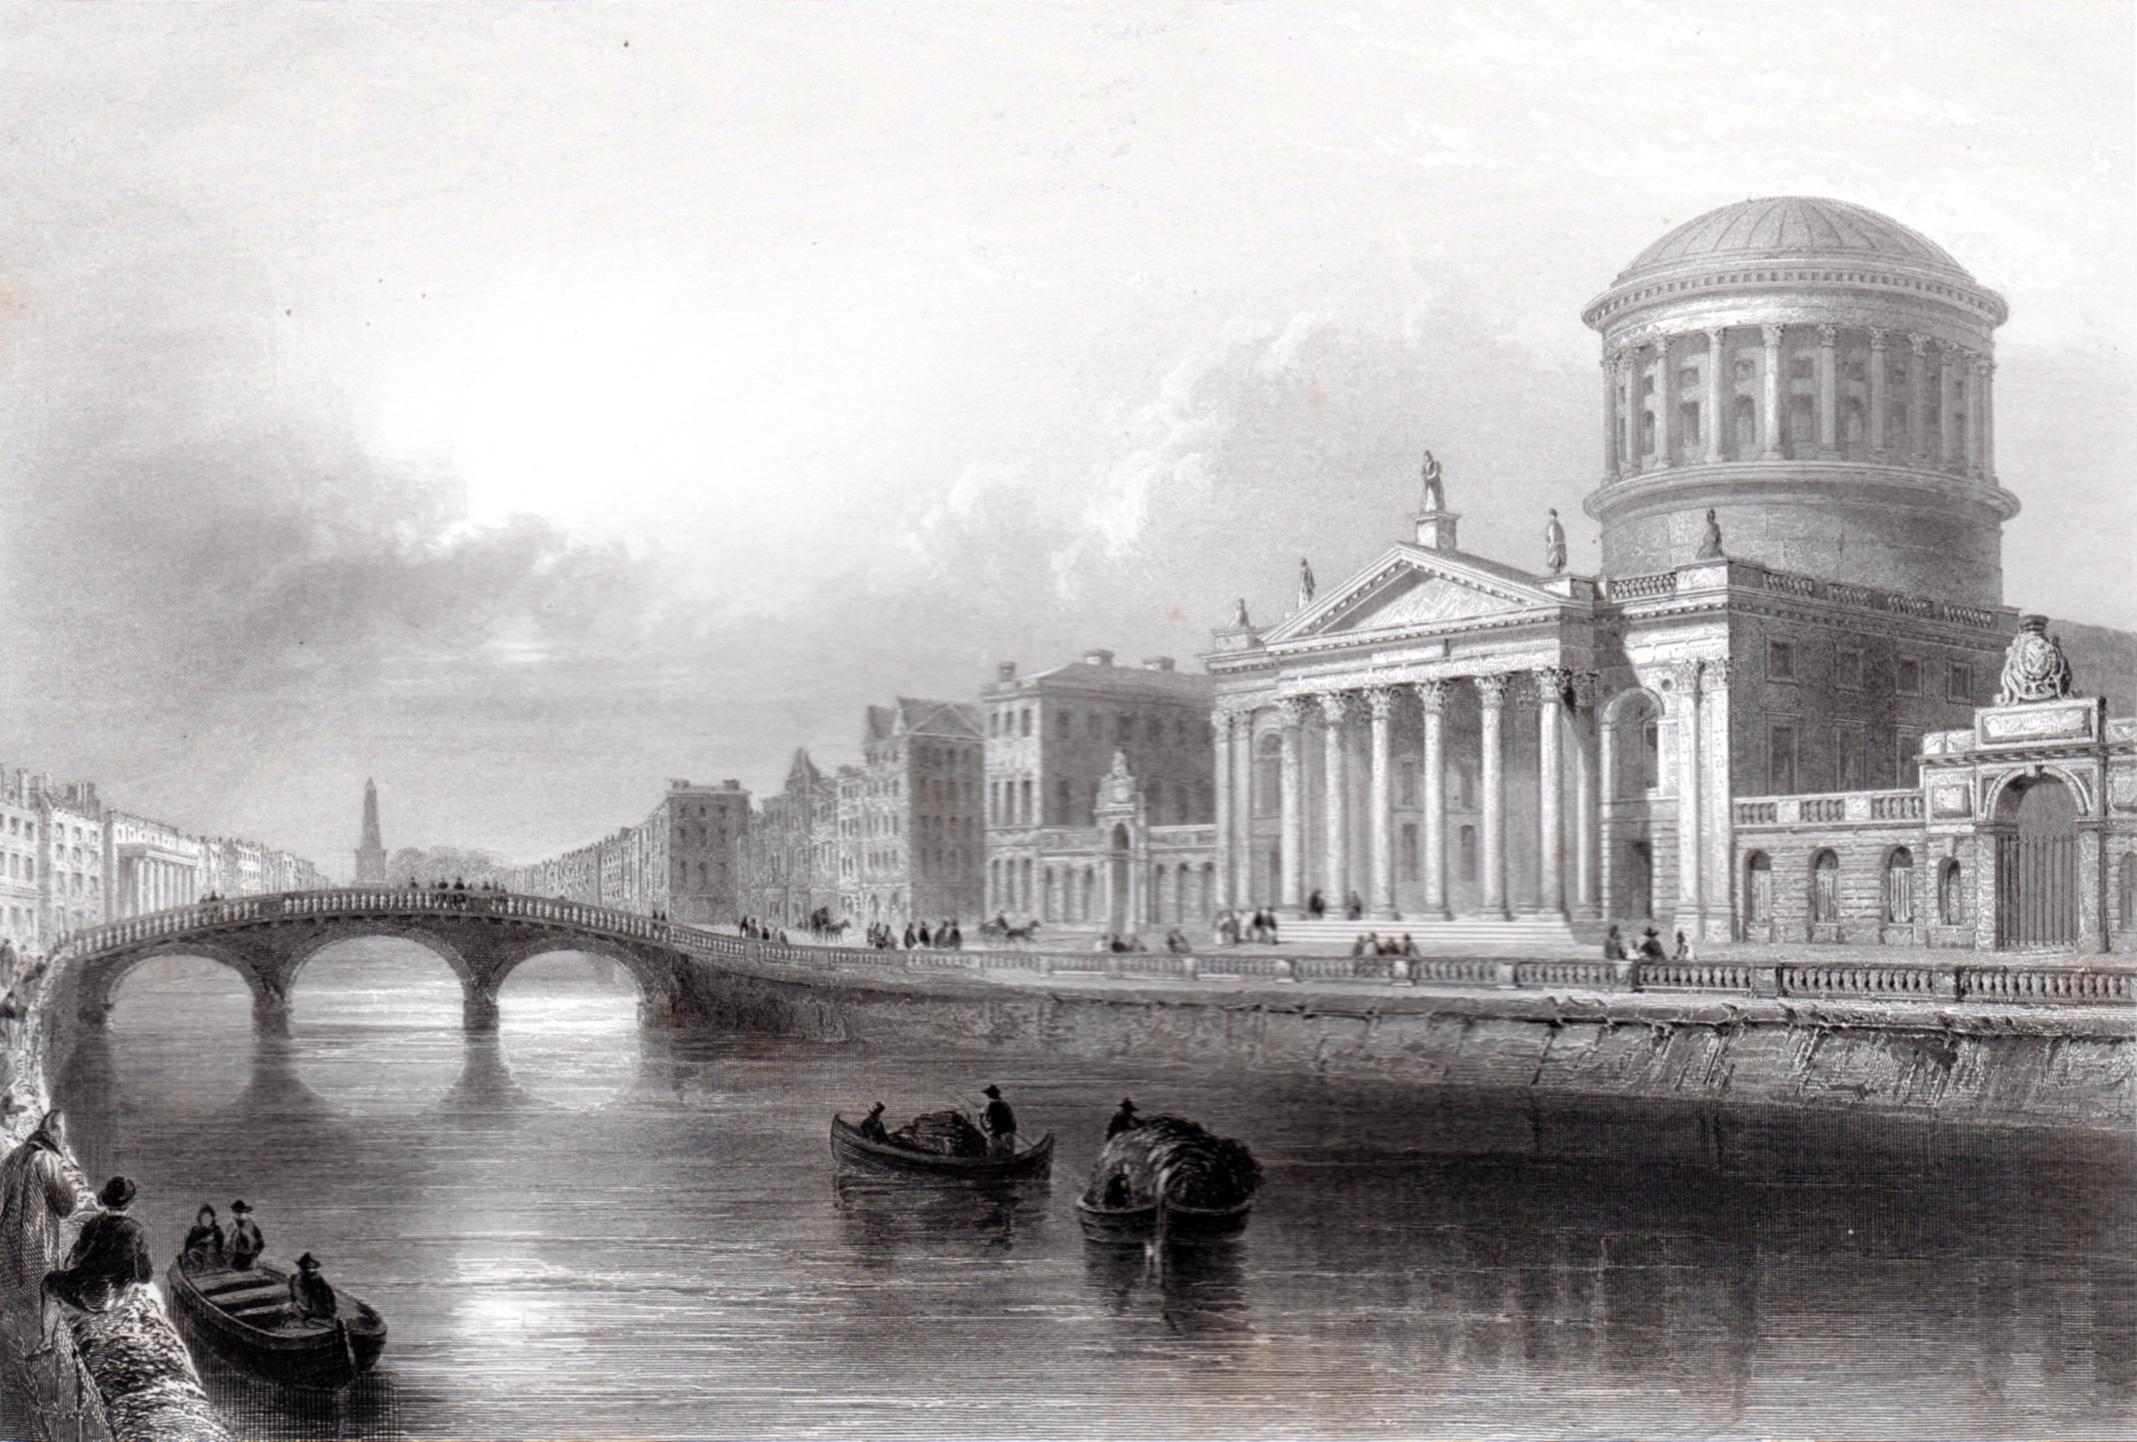 Bartlett, Wm Henry / Ireland